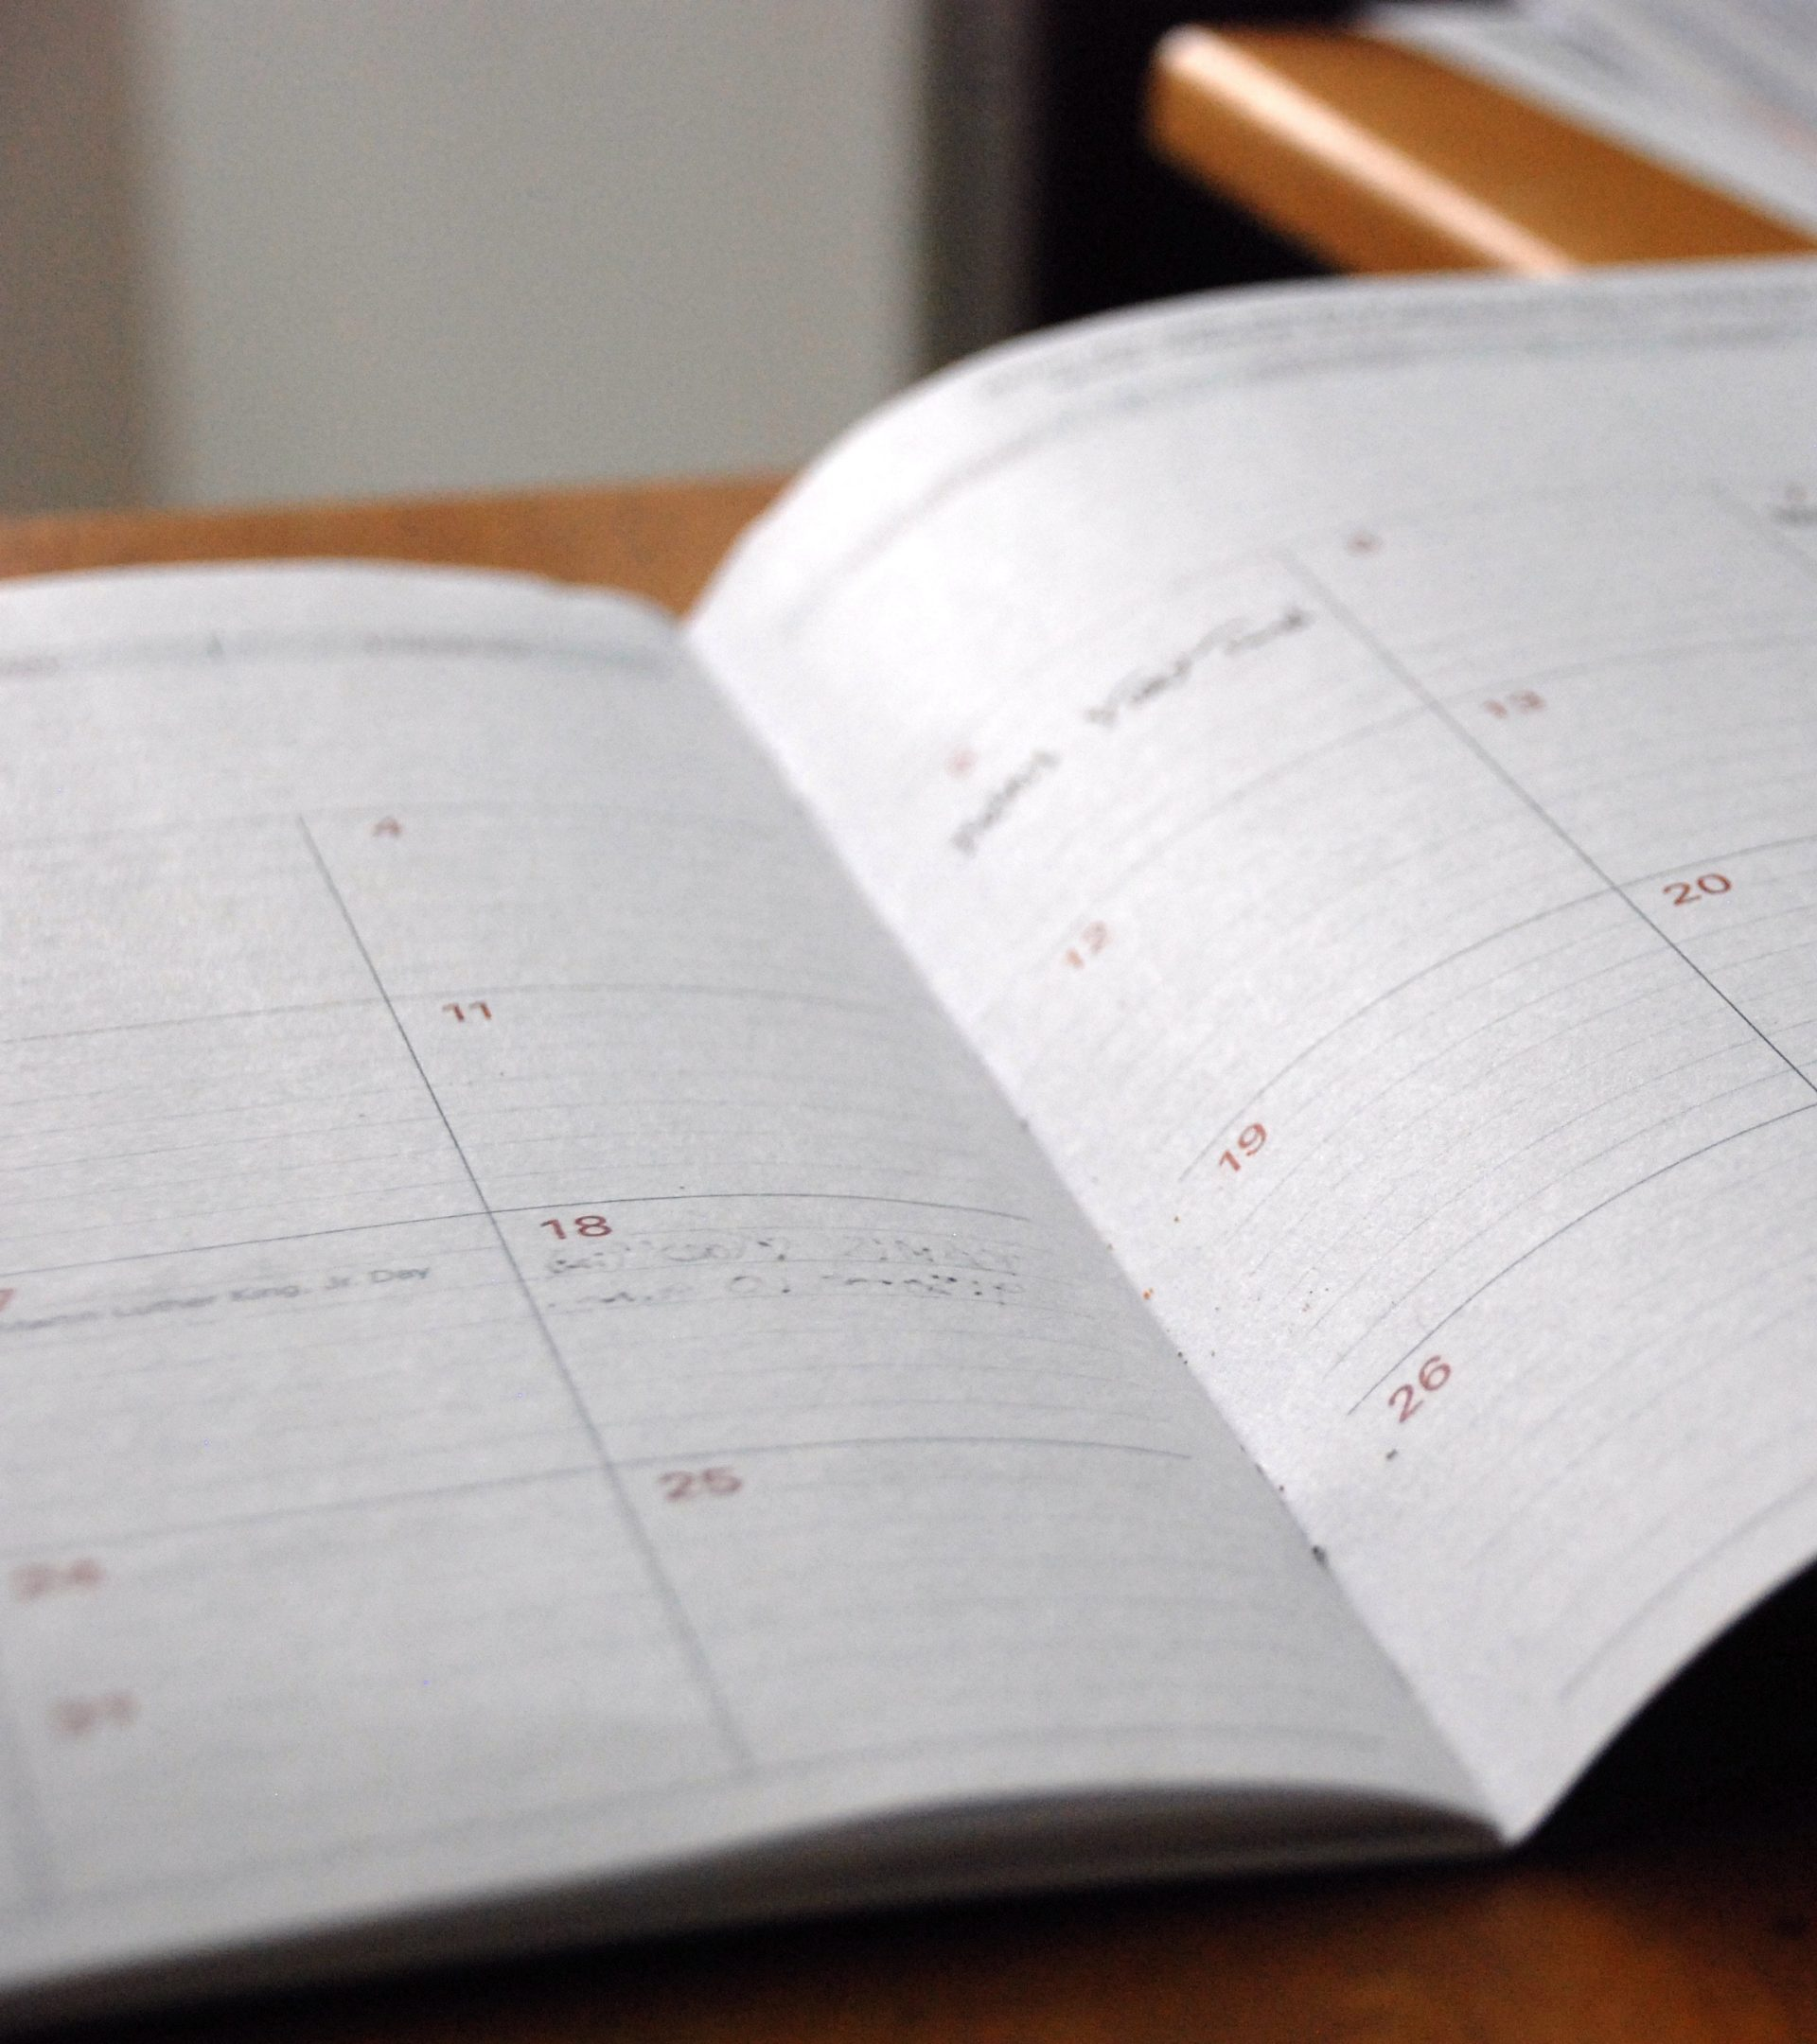 Kalender som ligger uppslagen.